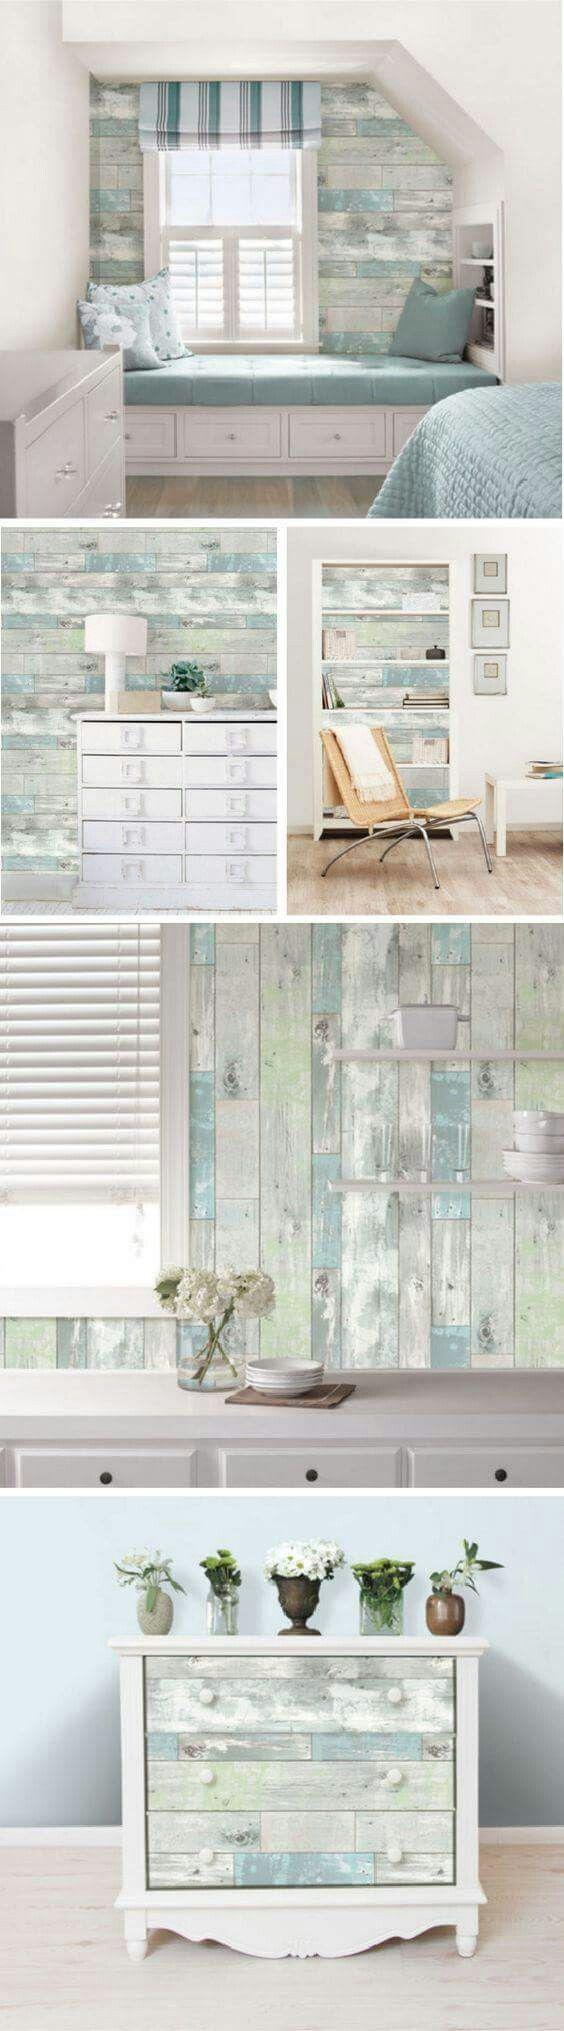 WallPops NuWallpaper Peel & Stick Wallpaper-Beachwood | Bunk rooms ...